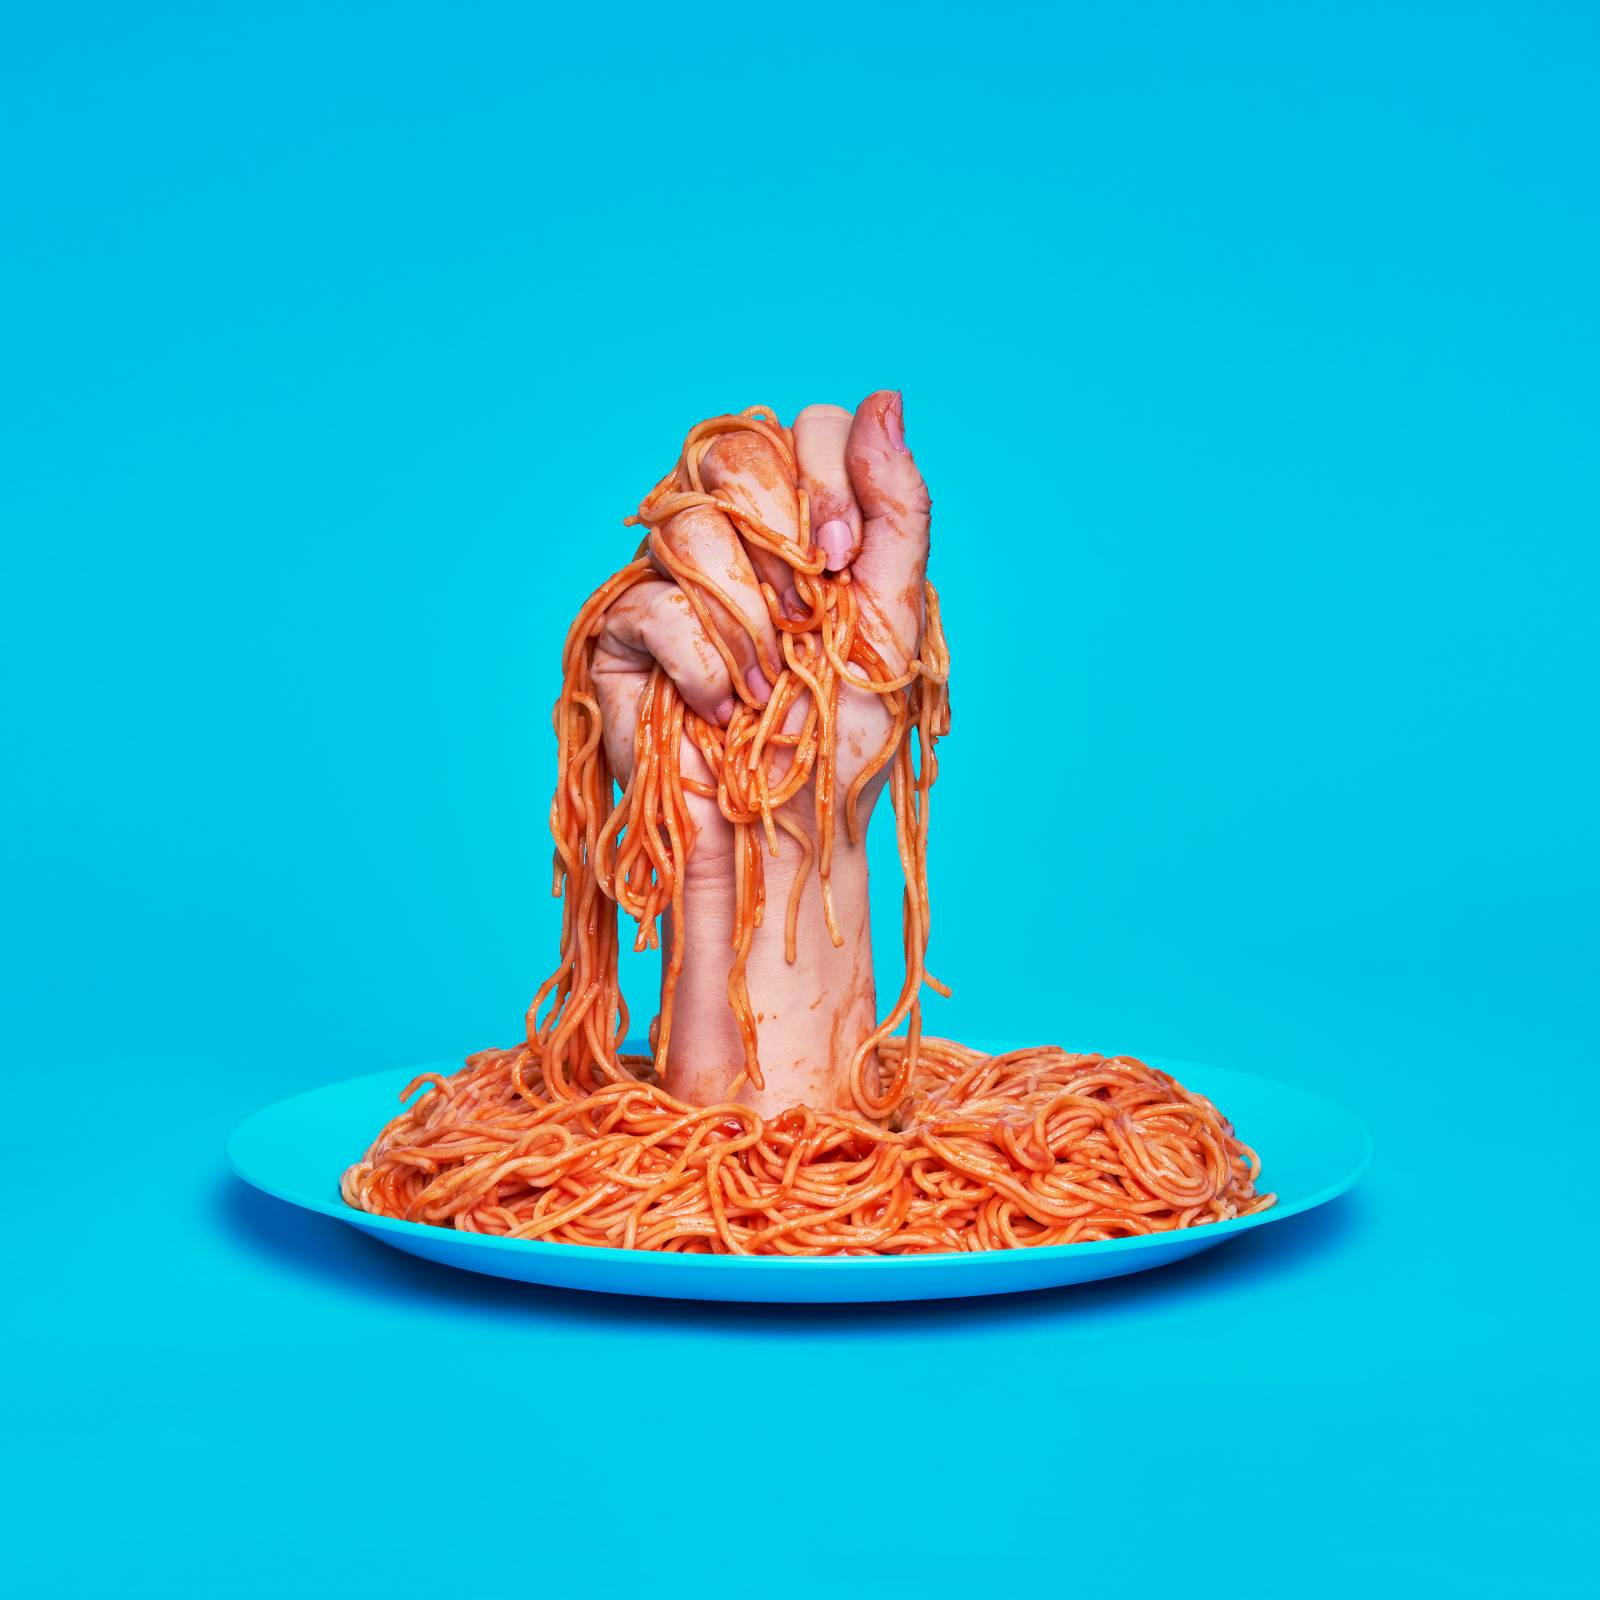 Spaghetti (2018) - Jaime Sánchez